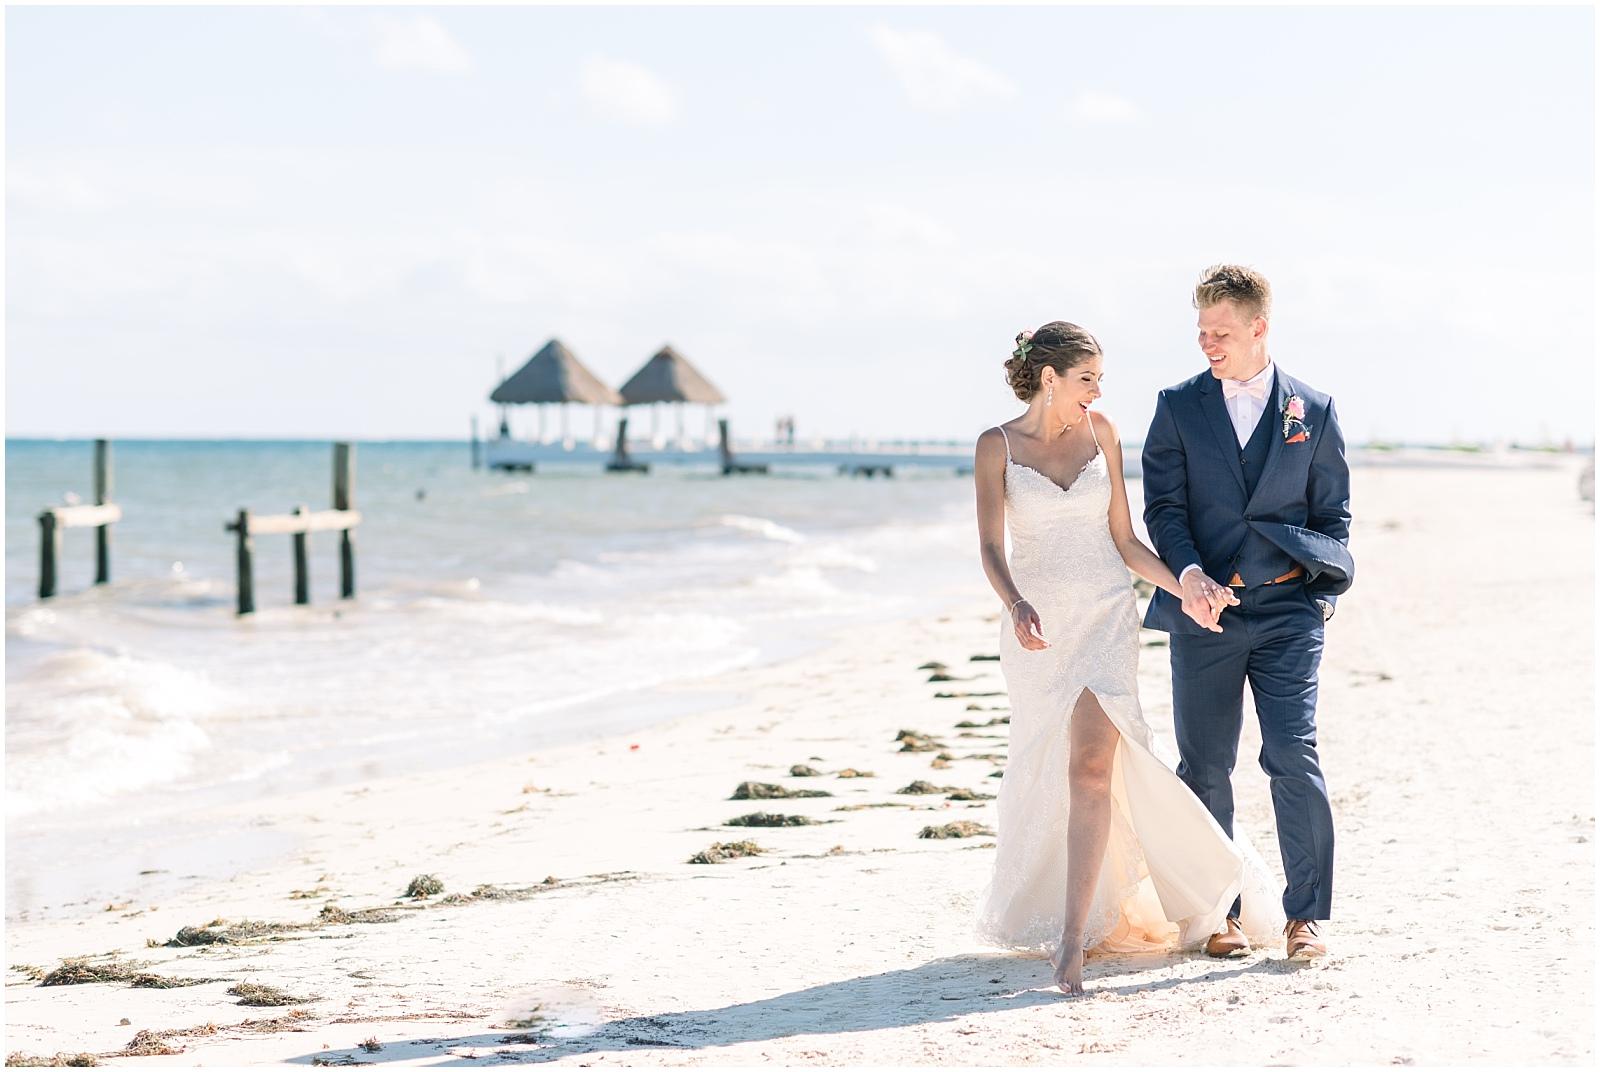 TJ_Now_Sapphire_Riviera_Cancun_Mexico_Wedding_Photos_0207.jpg